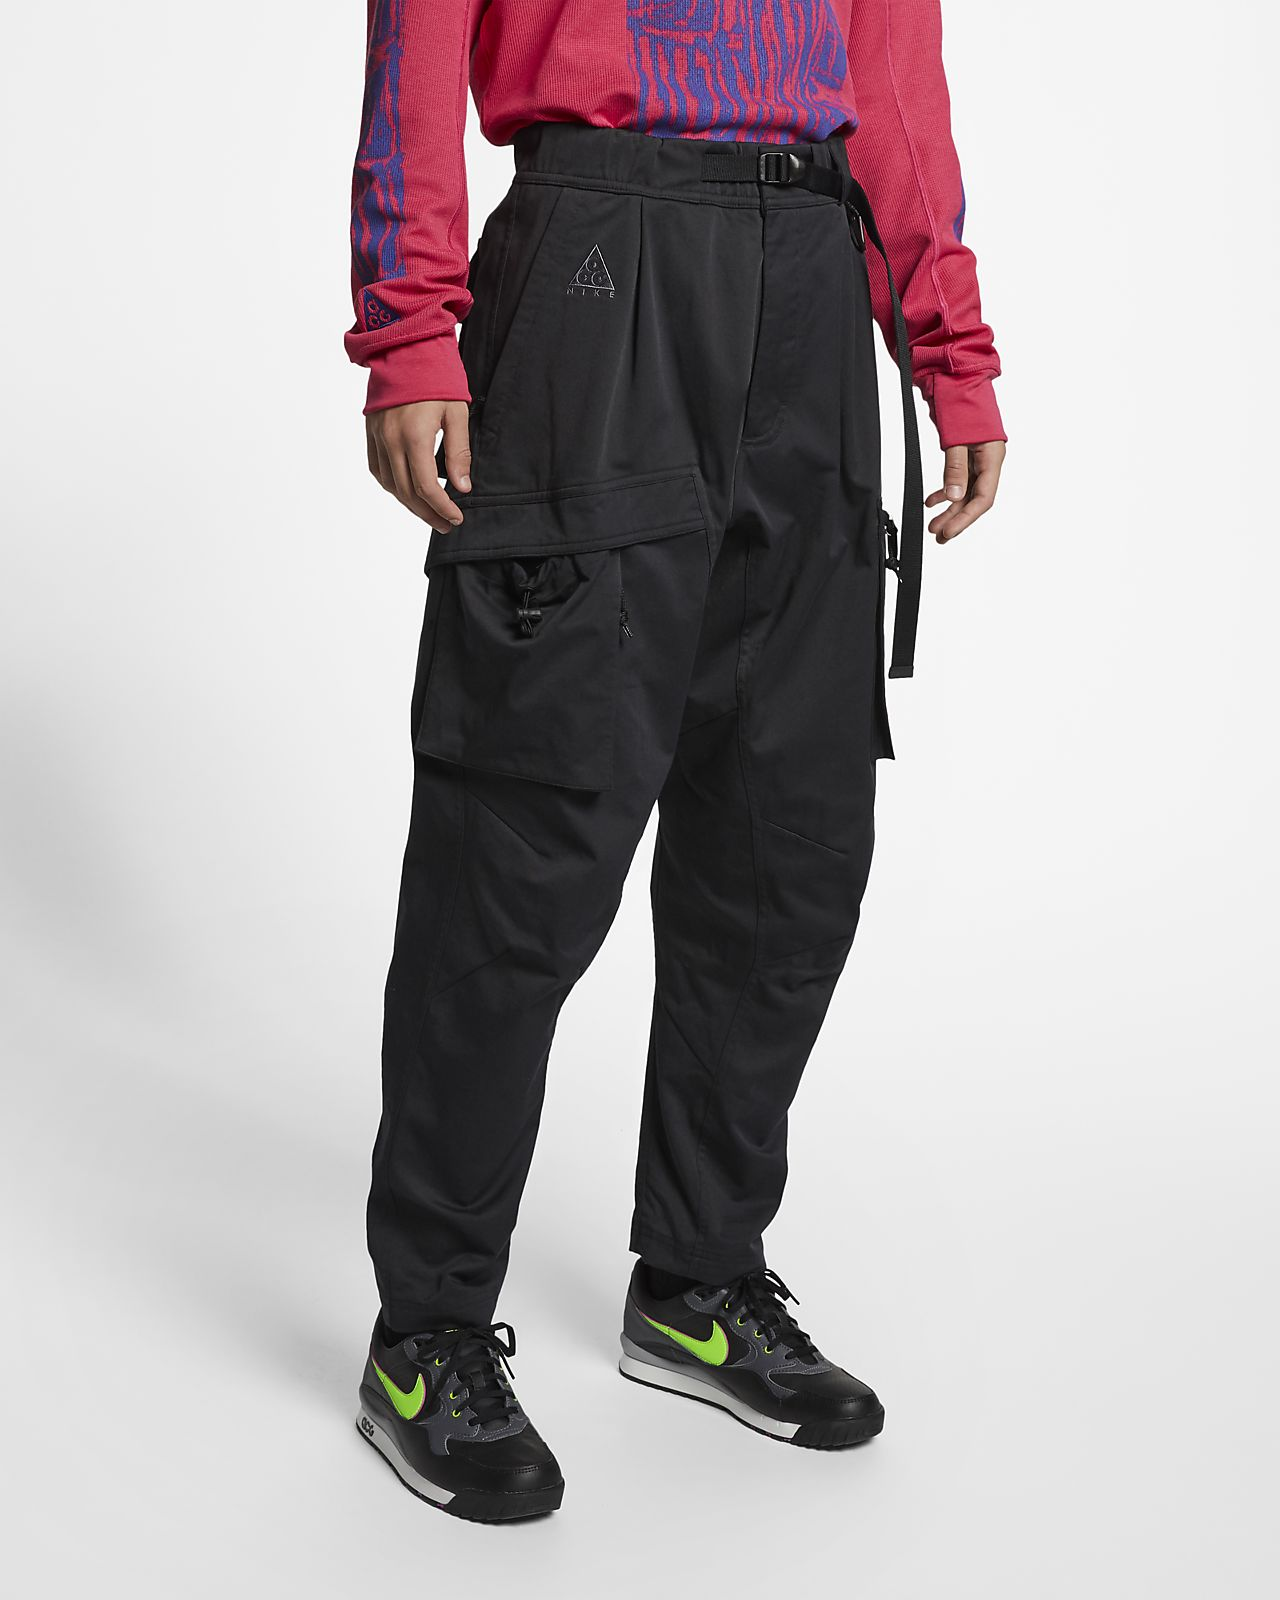 Pantaloni Nike ACG - Uomo